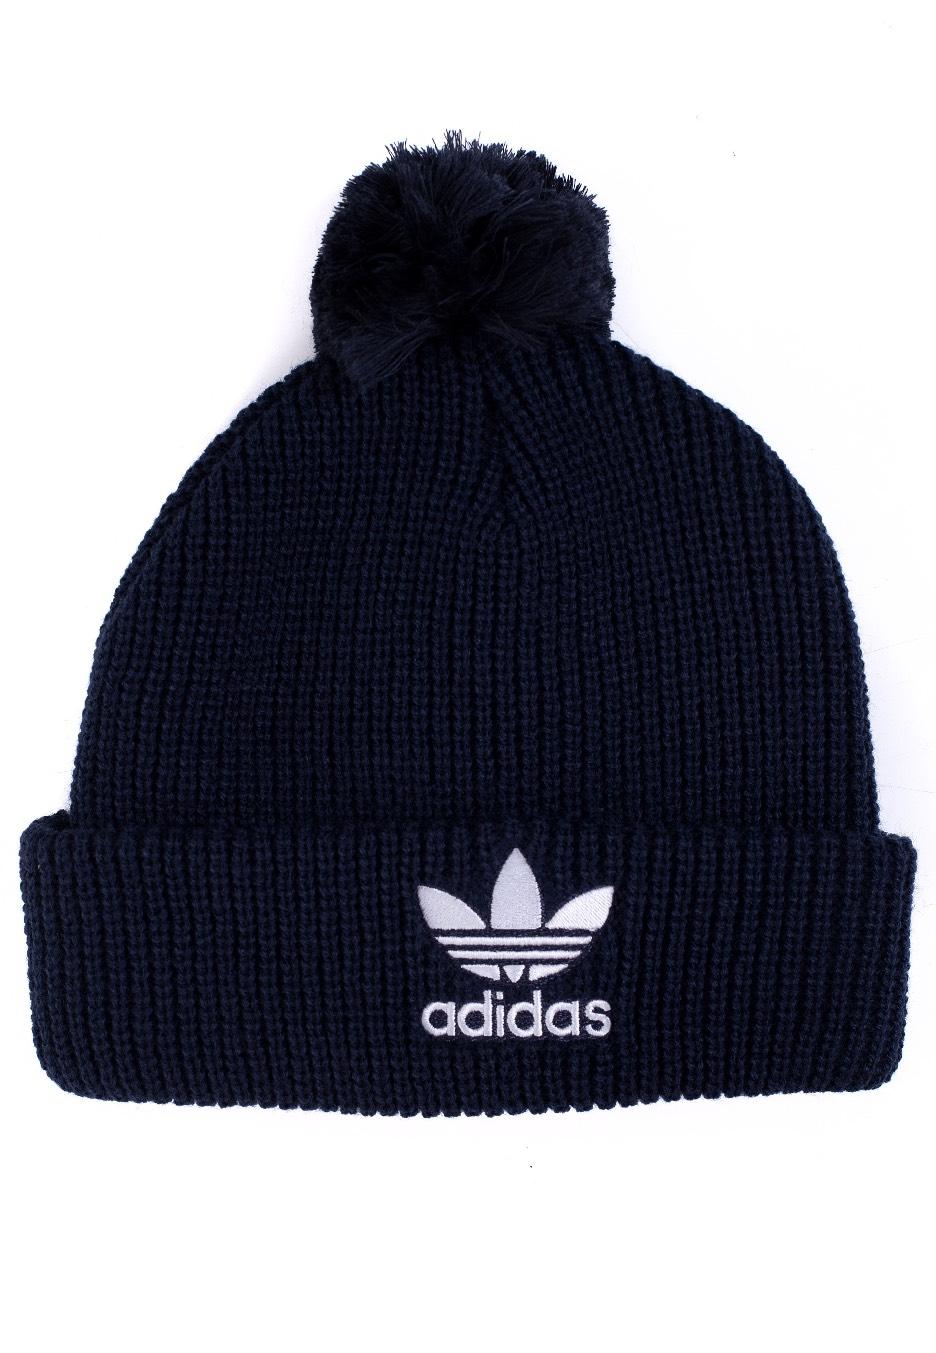 Adidas - Pom Pom Collegiate Navy - Beanie - Streetwear Shop - Impericon.com  US 6a85f1c0c1b